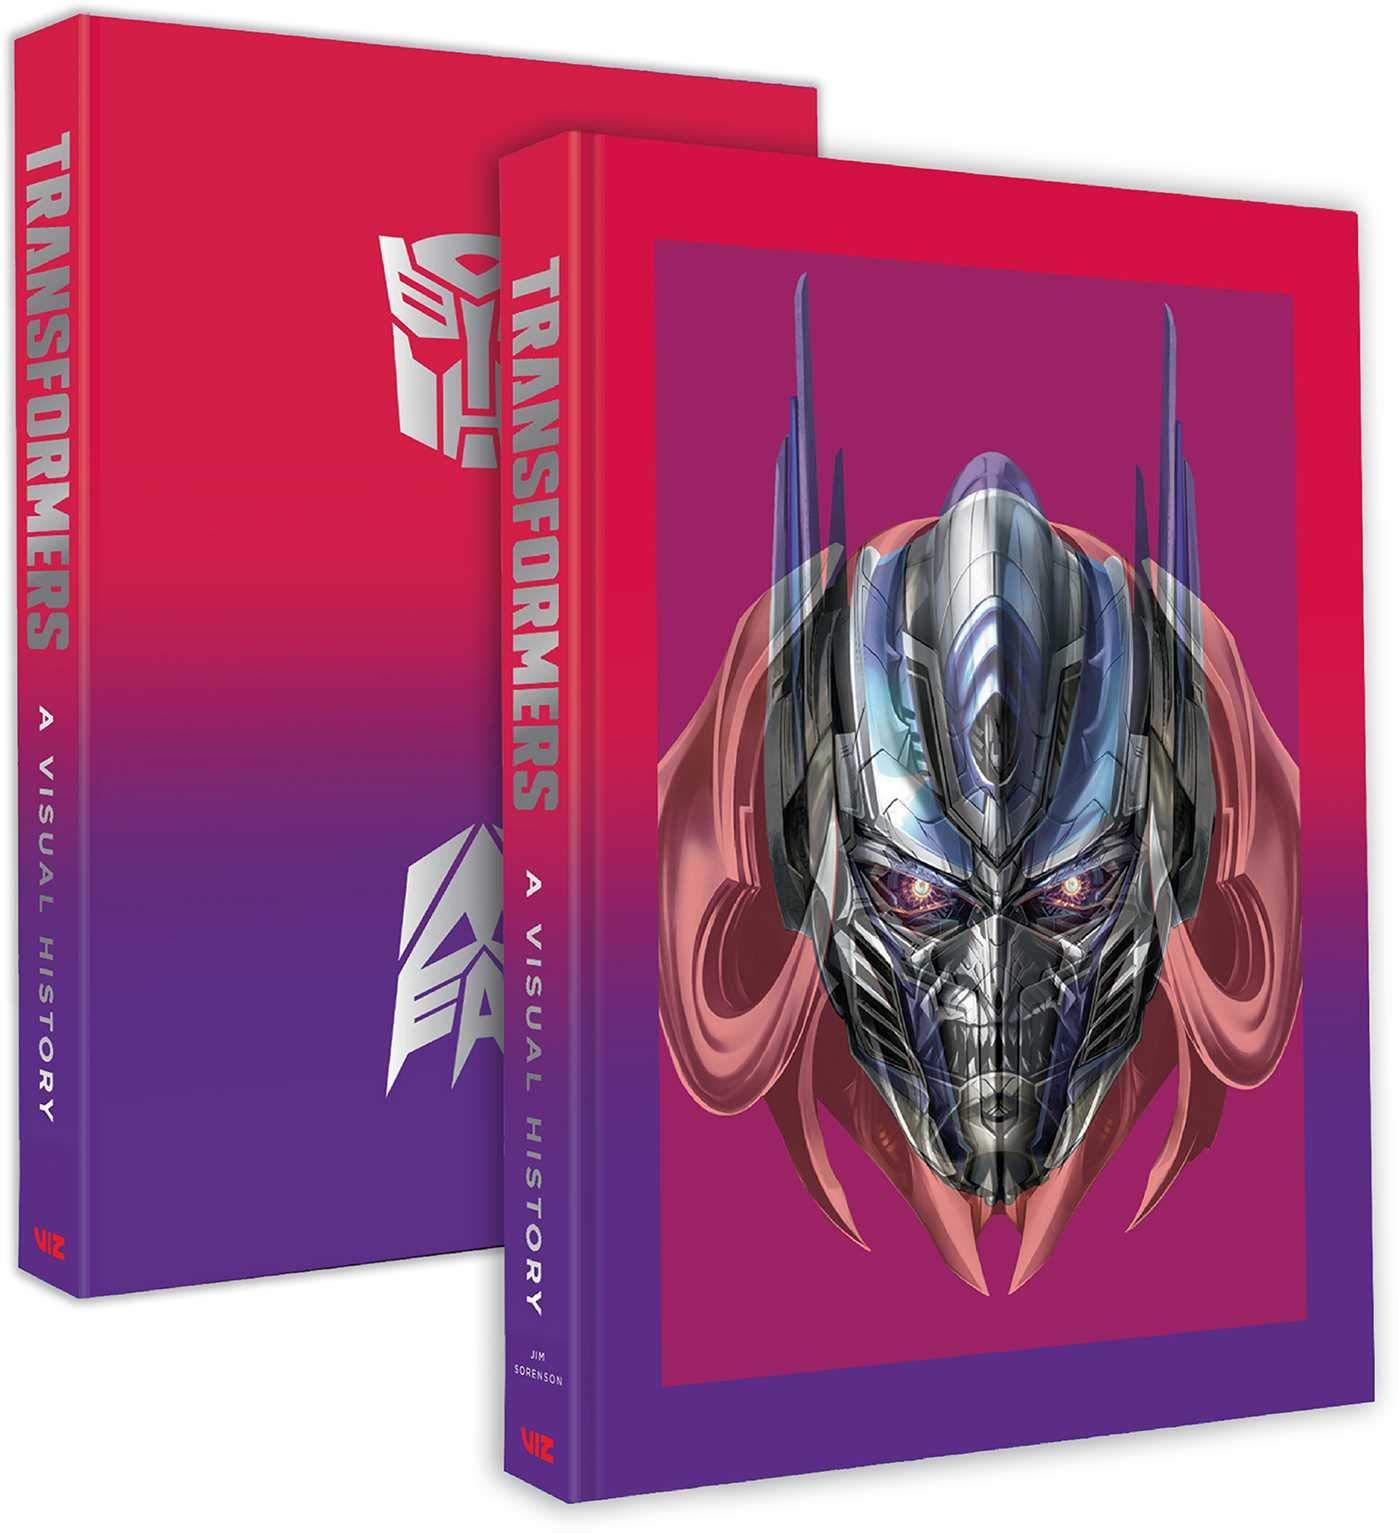 Transformers: A Visual History (Limited Edition) by VIZ Media LLC